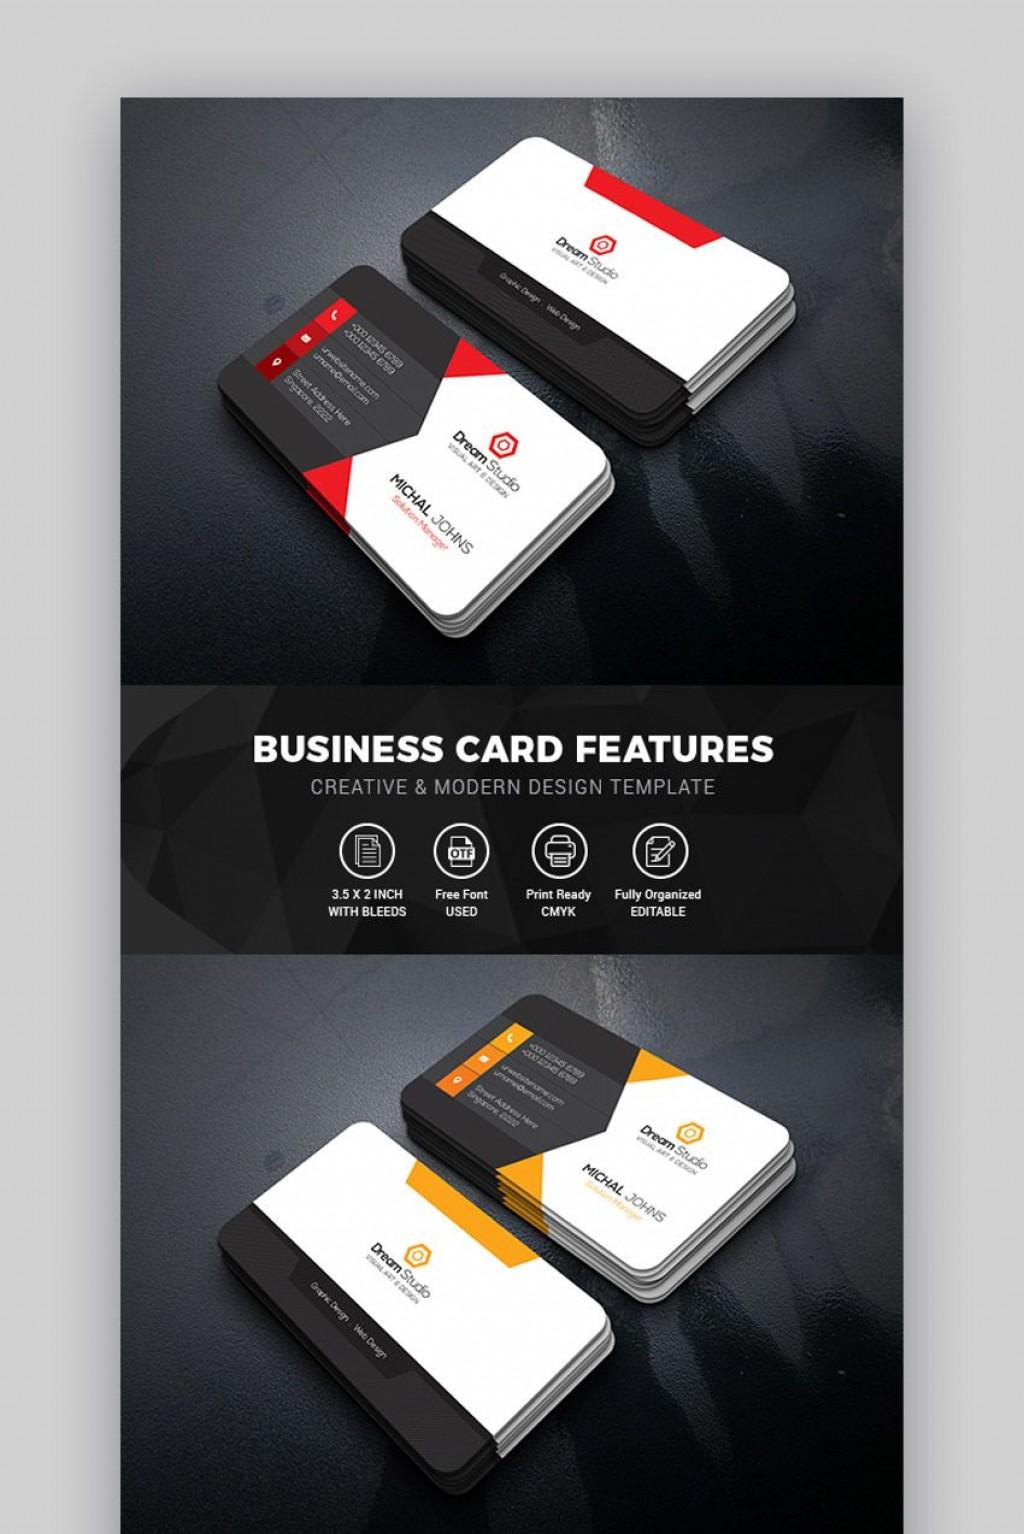 008 Wonderful Free Blank Busines Card Template Photoshop Image  Download PsdLarge